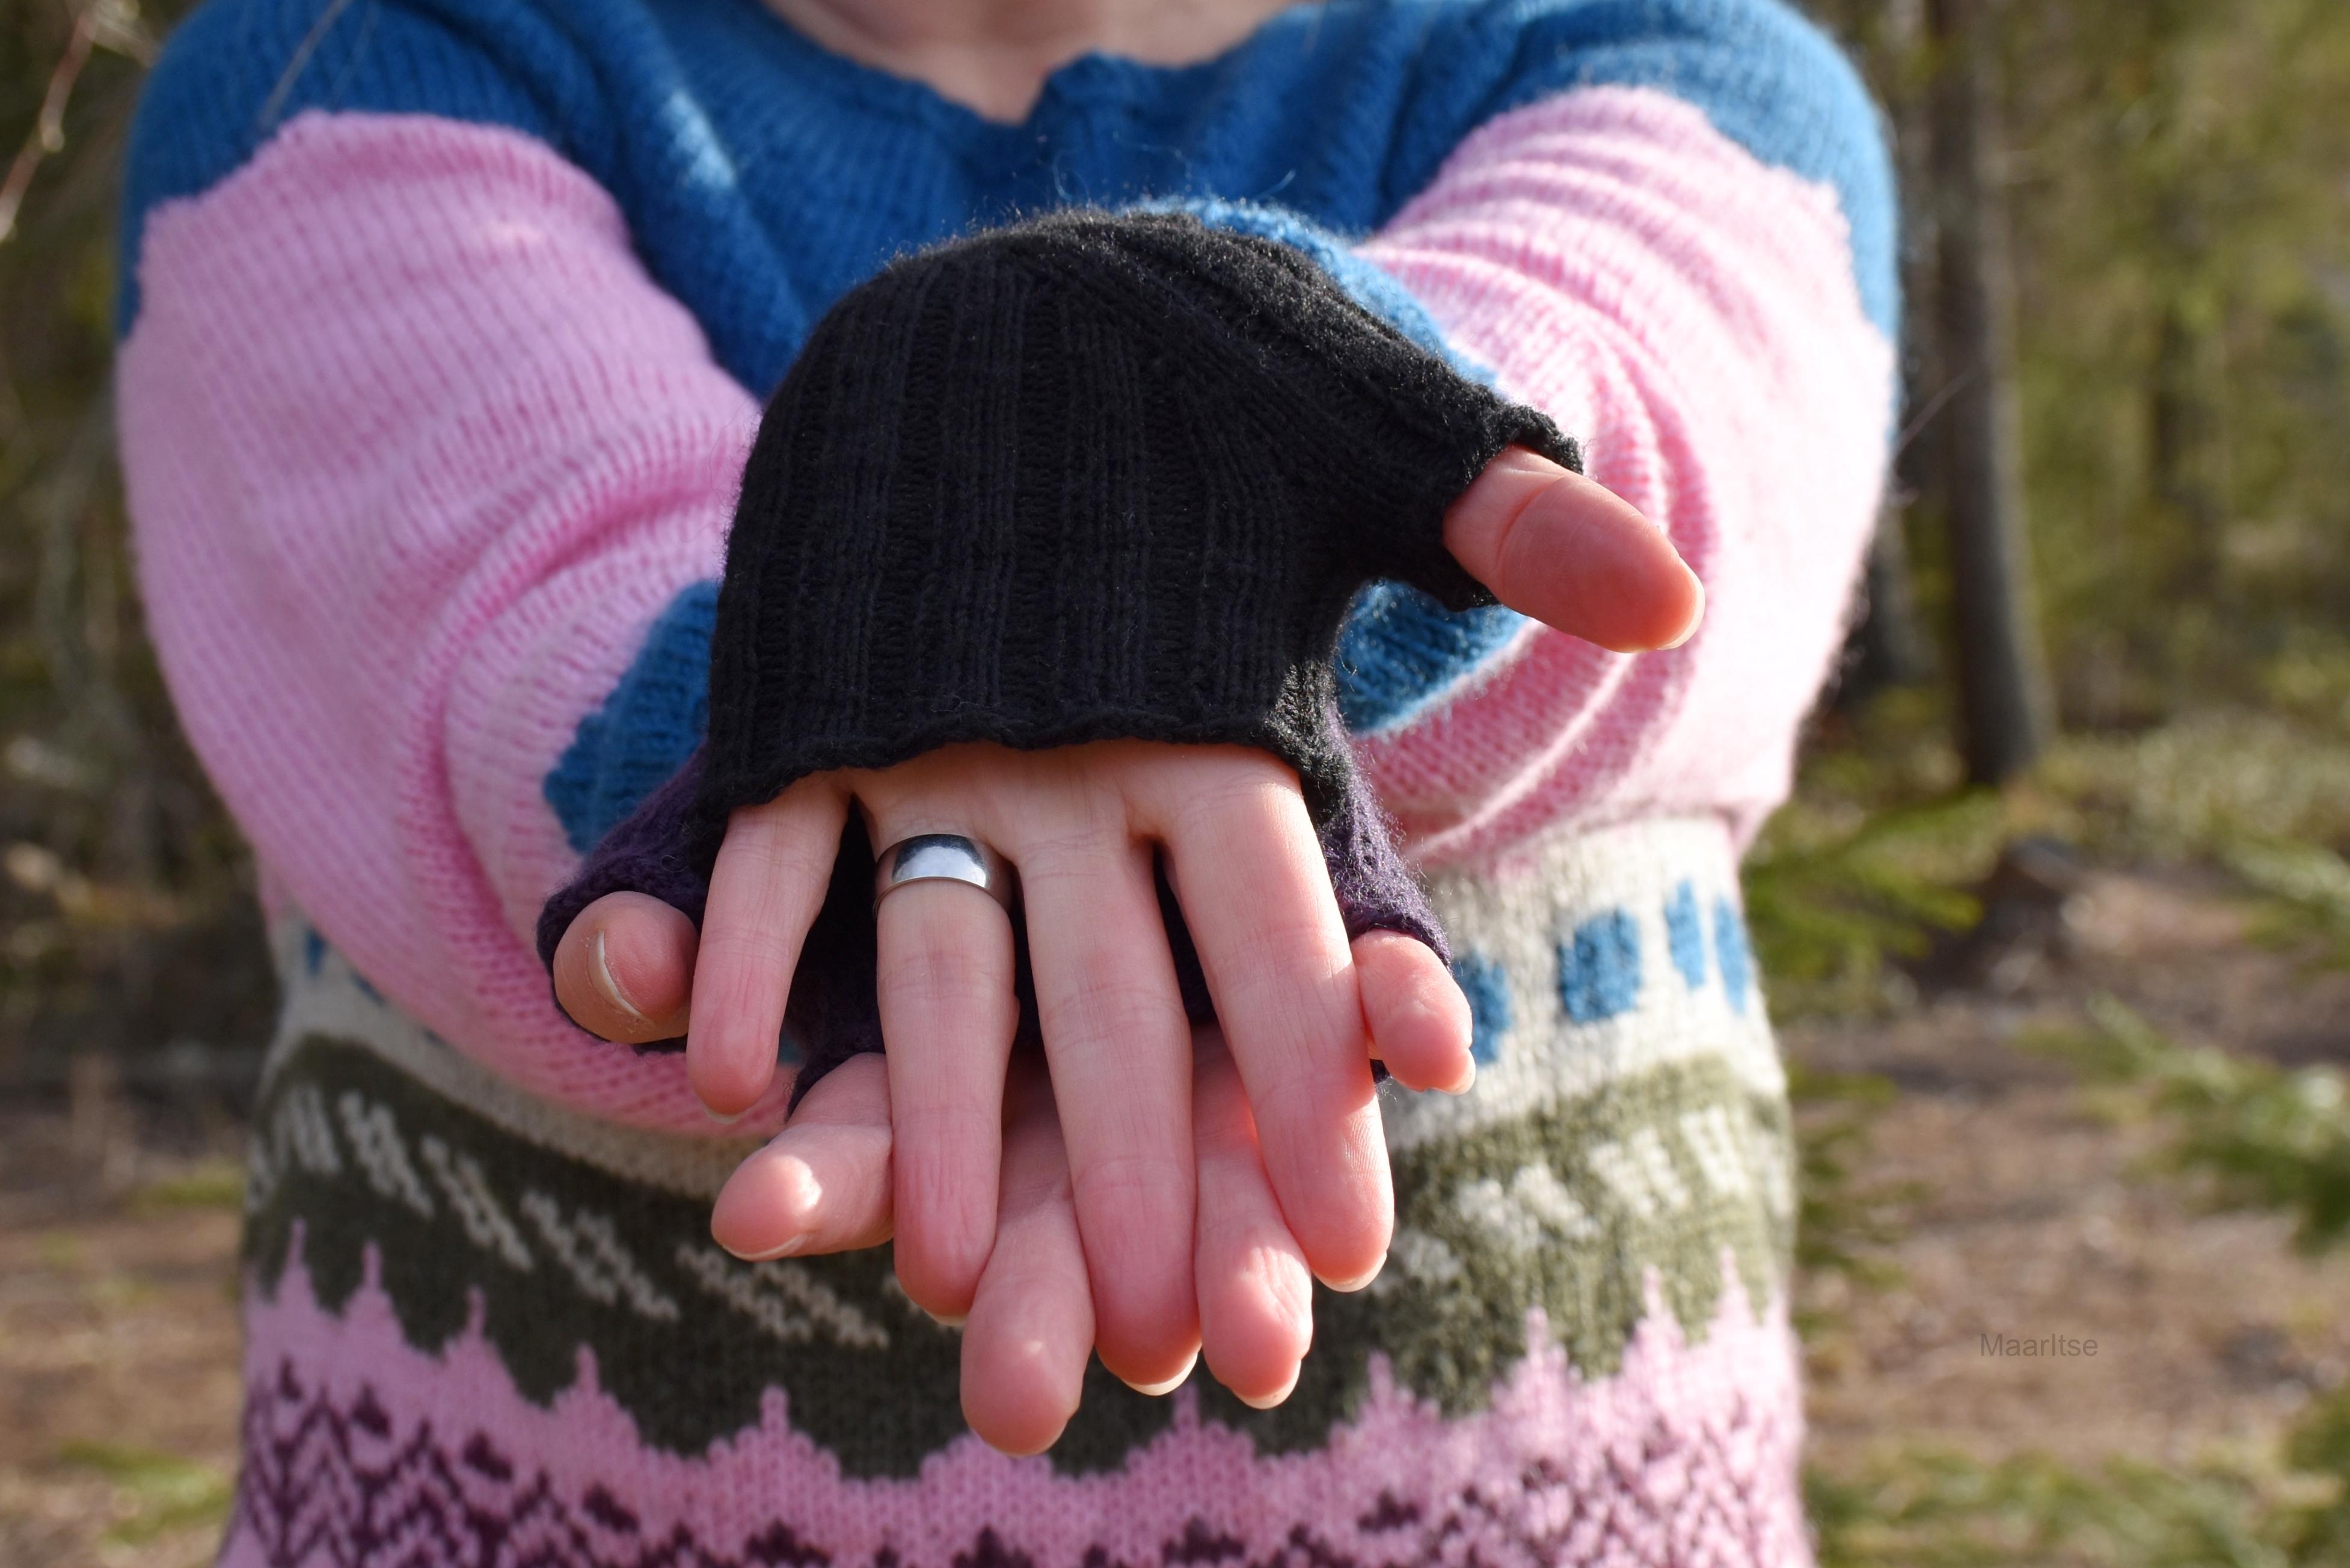 maaritse_knitted_headband_and_pioneer_gloves